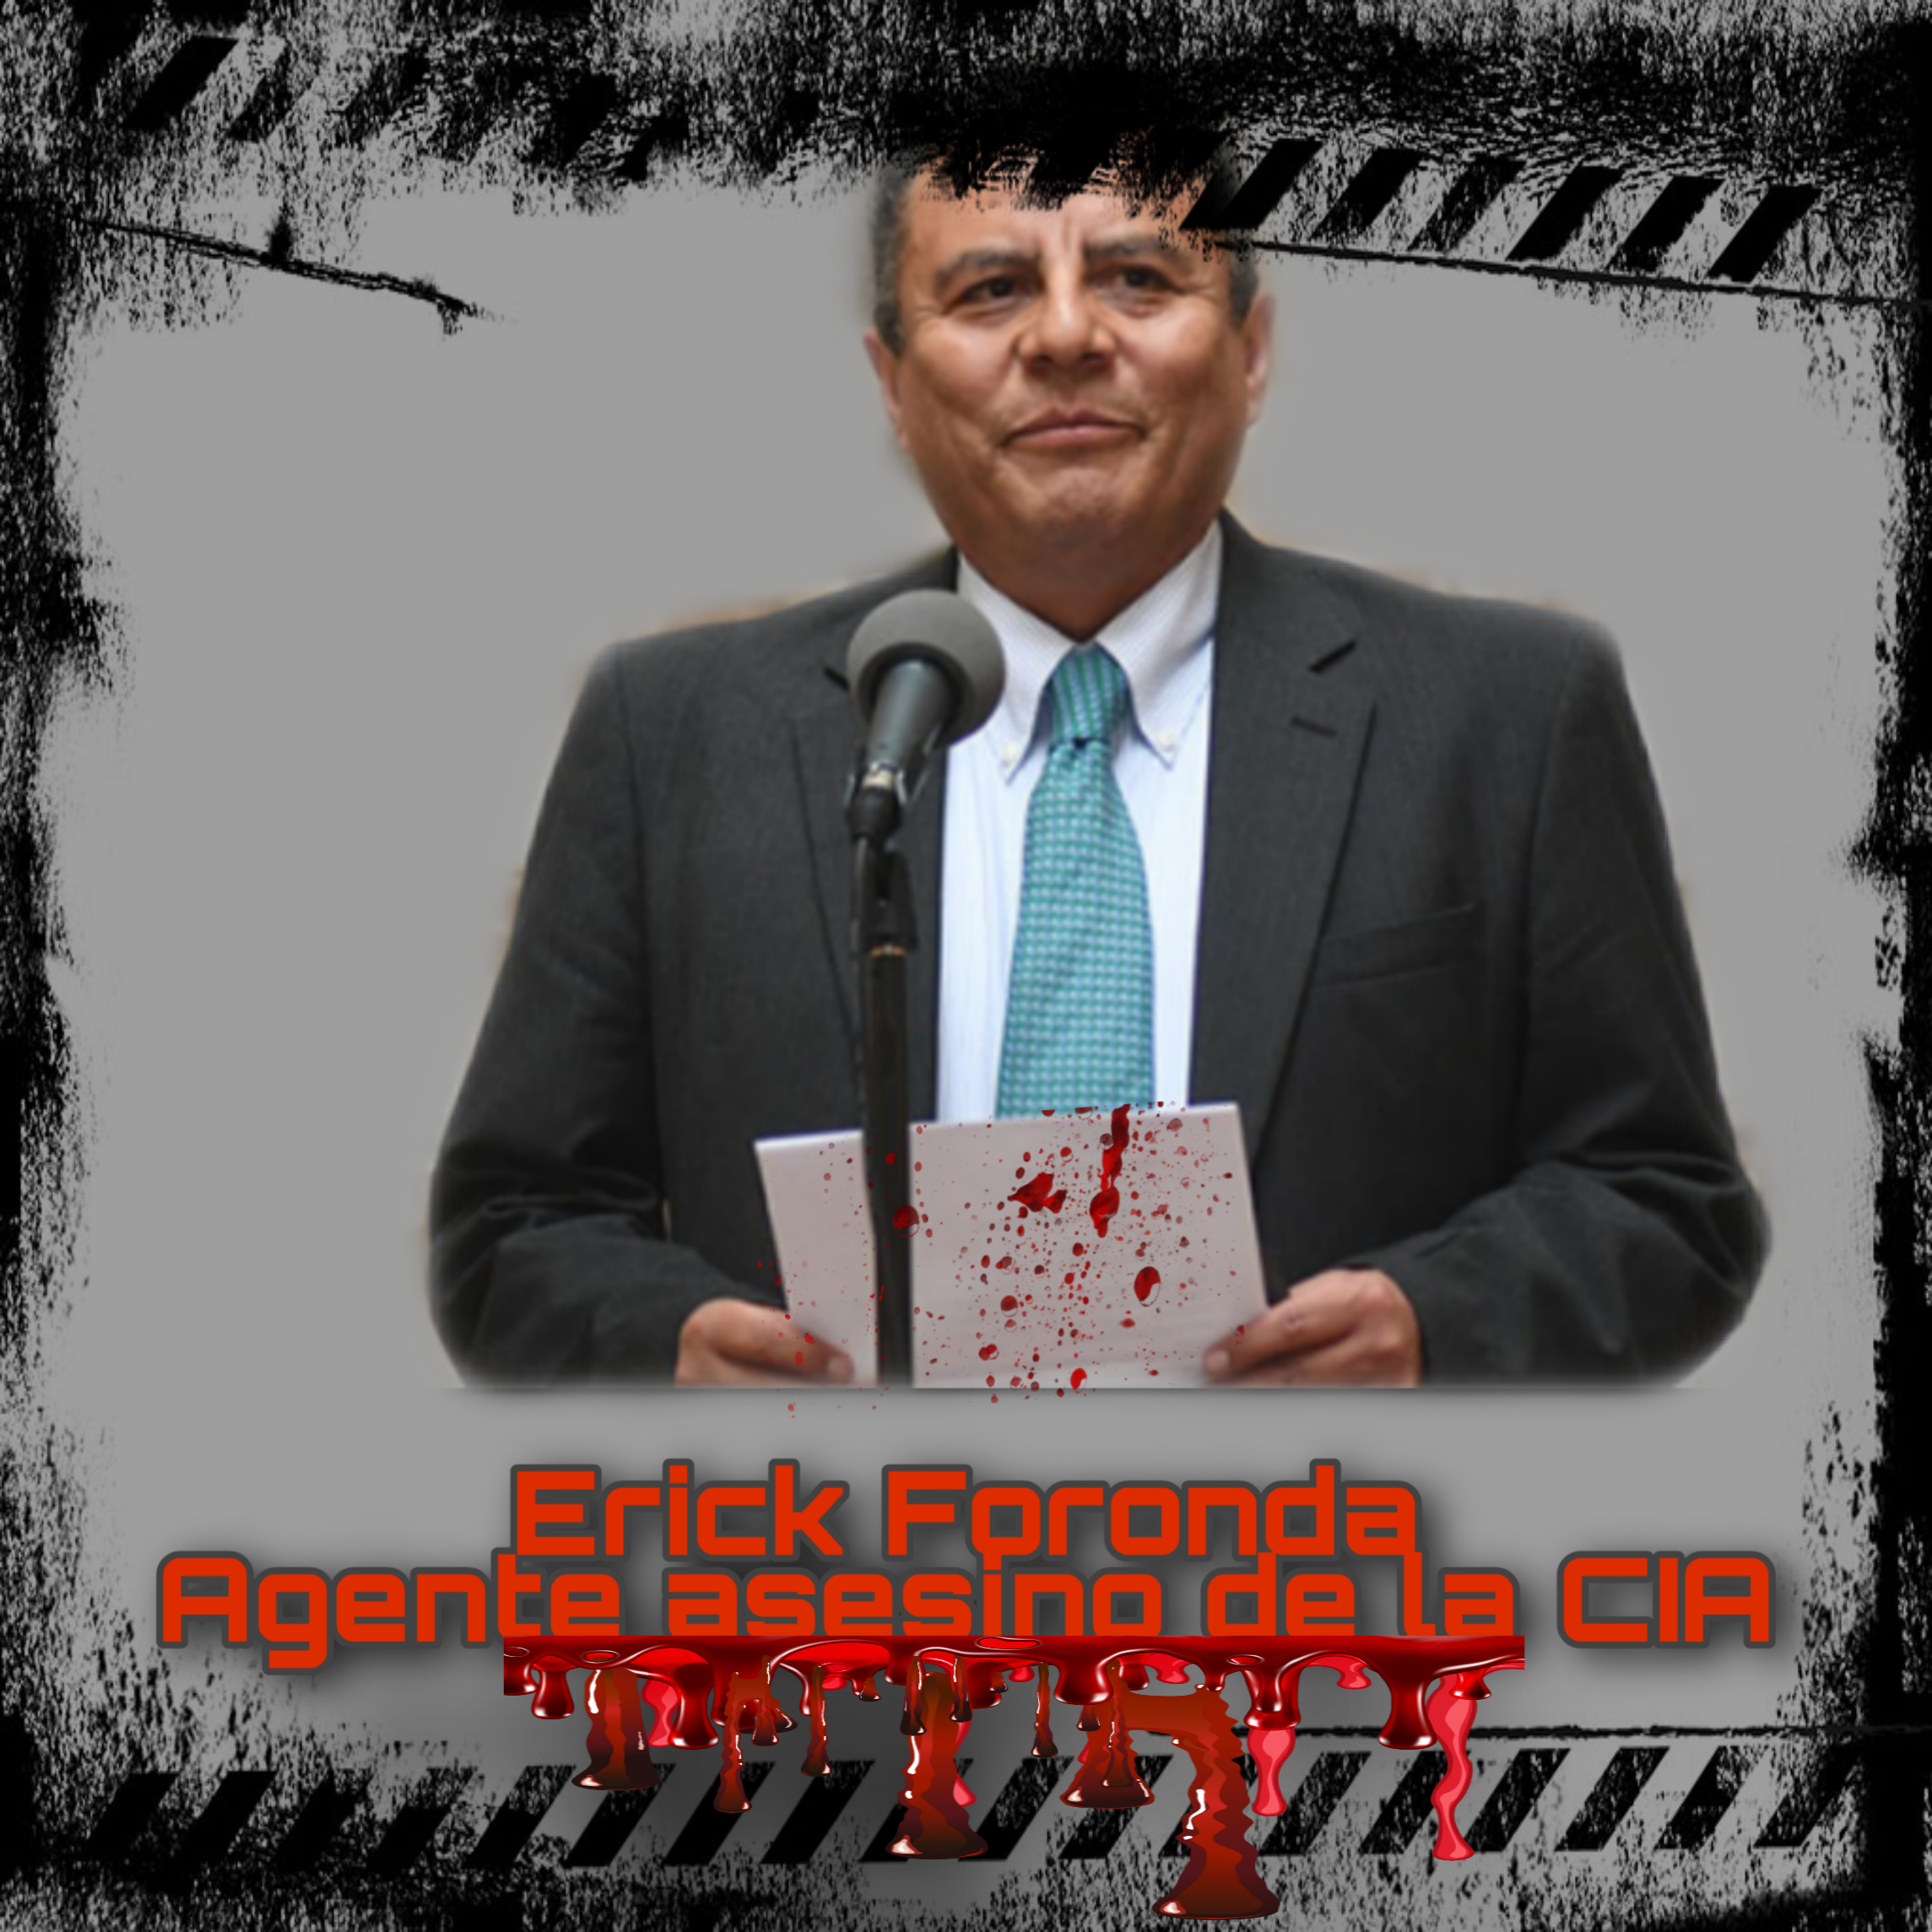 ERICK FORONDA FUE EL DUEÑO DE LA PRENSA REACCIONARIA DE BOLIVIA